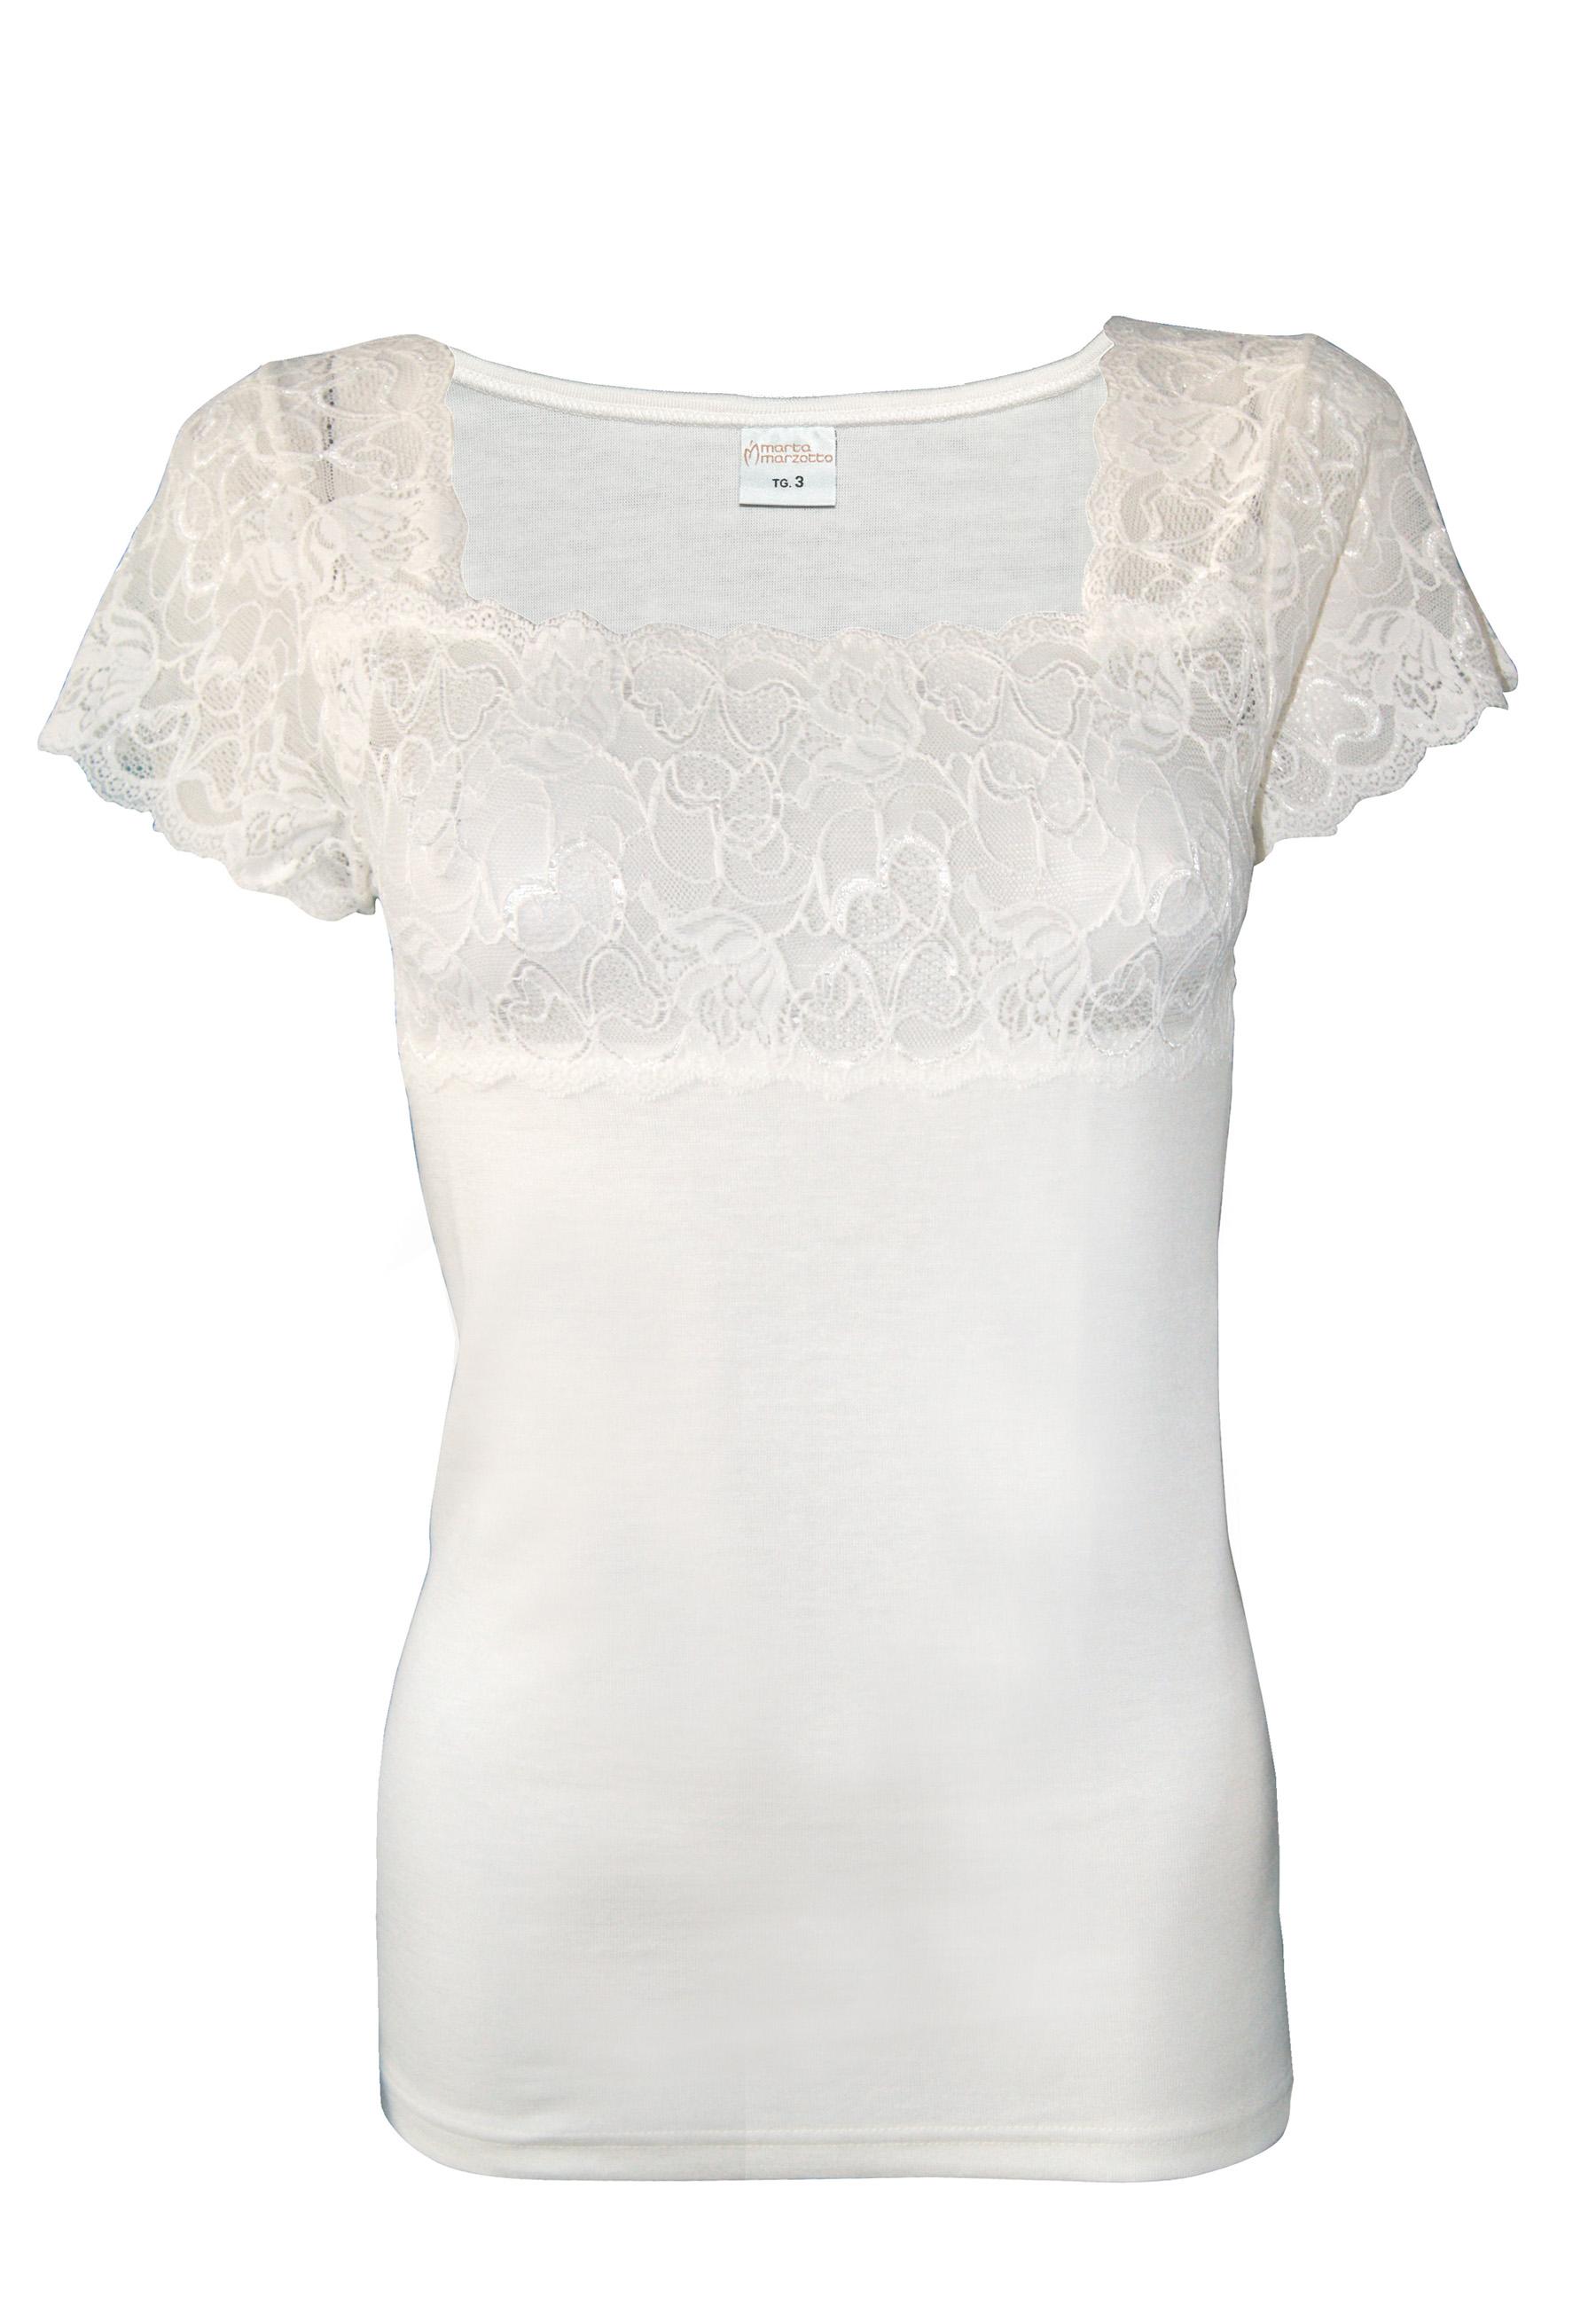 19bc4bb013e Ισοθερμική γυναικεία μπλούζα-φανέλλα με δαντέλα Κοντό μανίκι Μαλλί βαμβάκΙ  Λευκό ...